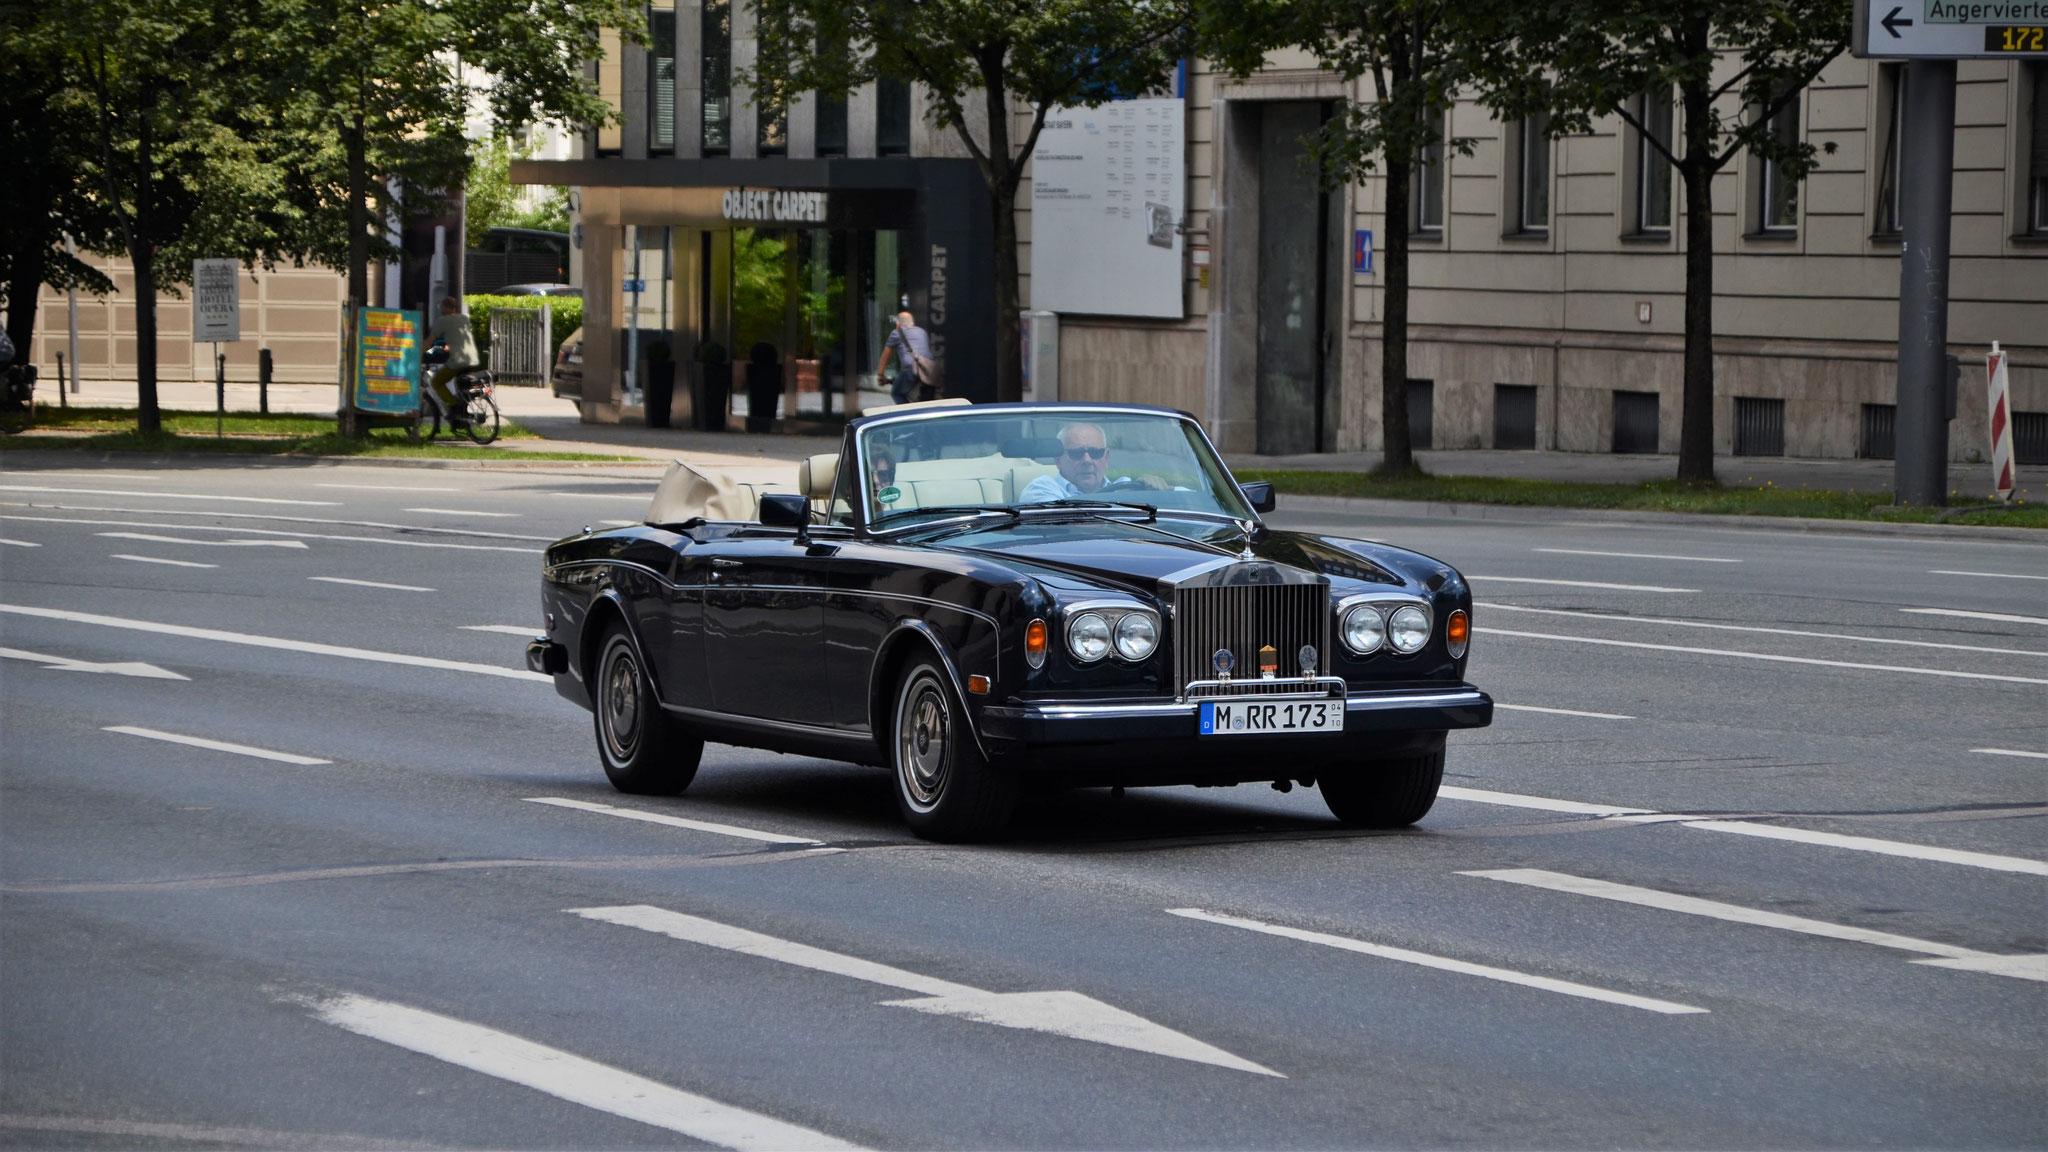 Rolls Royce Corniche - M-RR-173